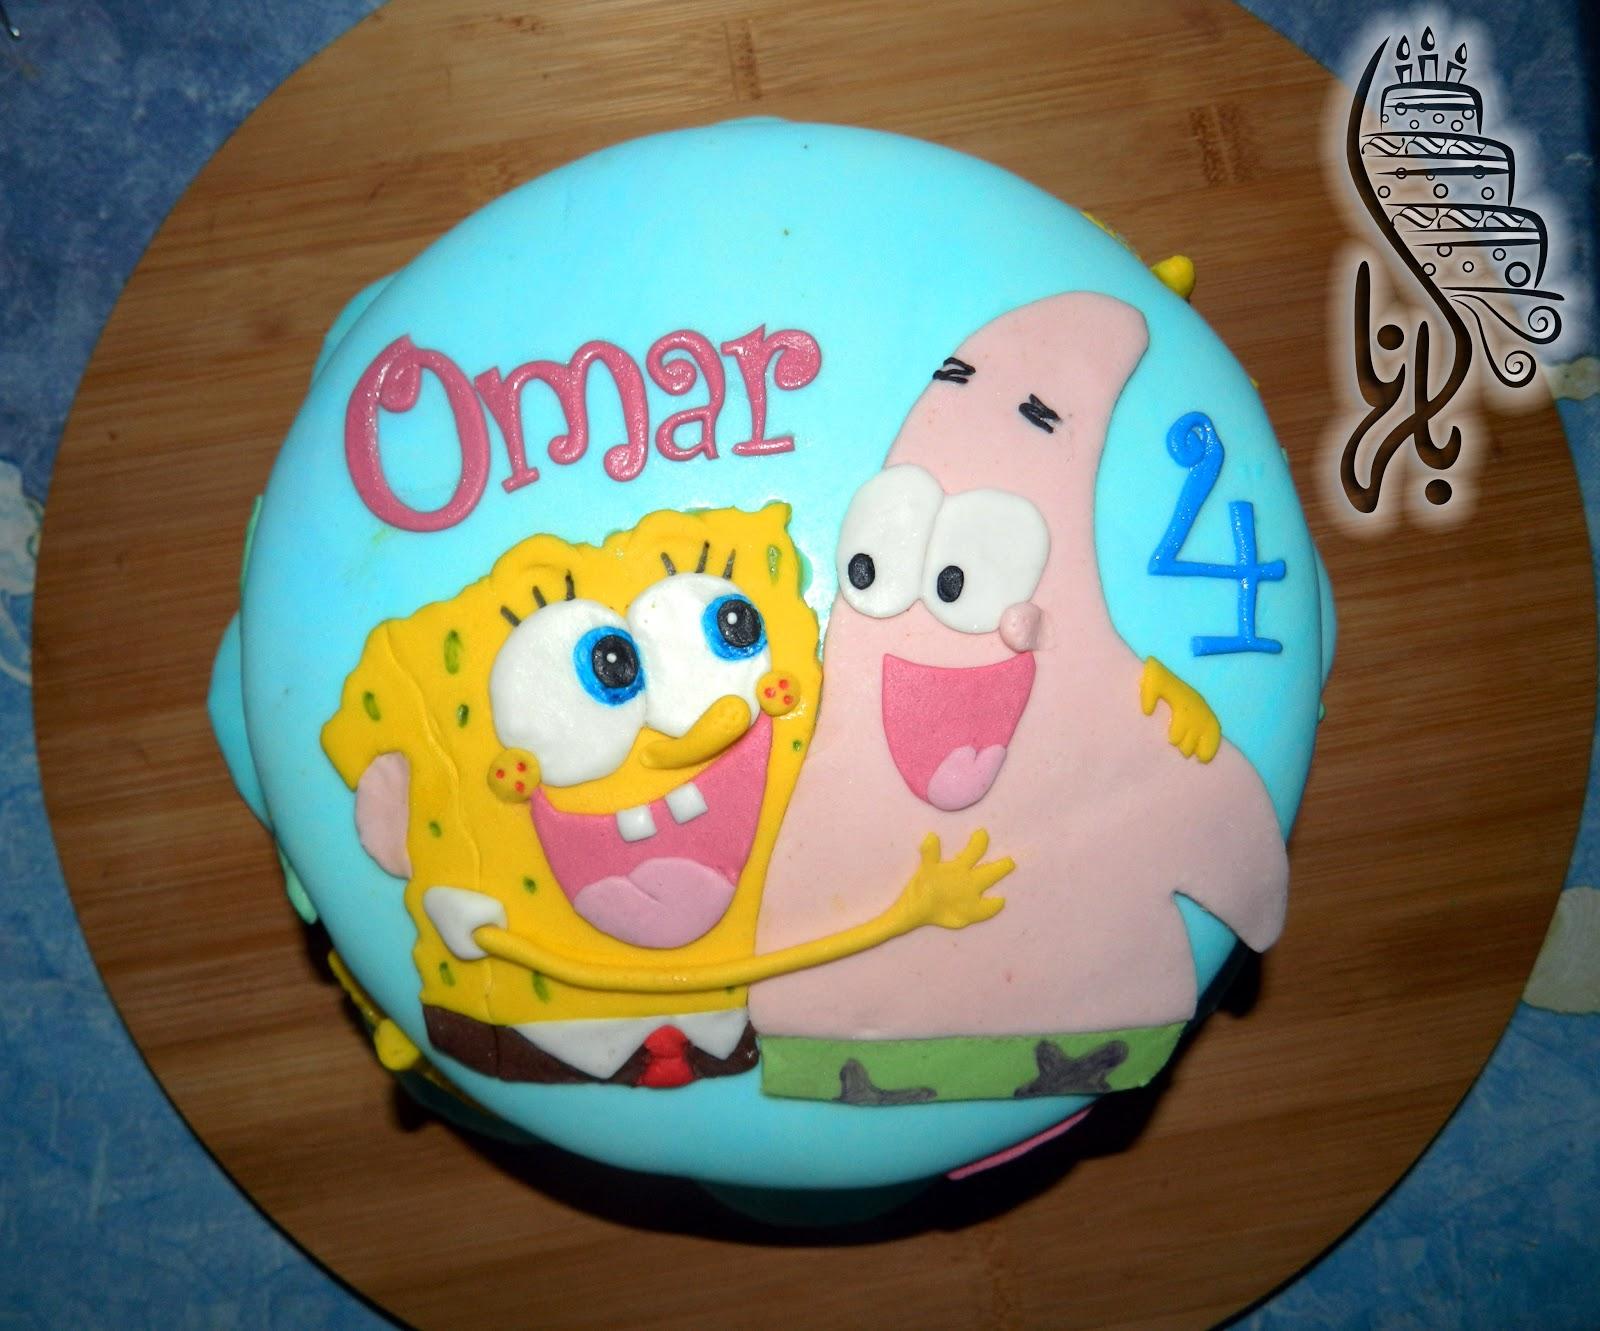 spongebob u0026 patrick cake bel hana بالهنا